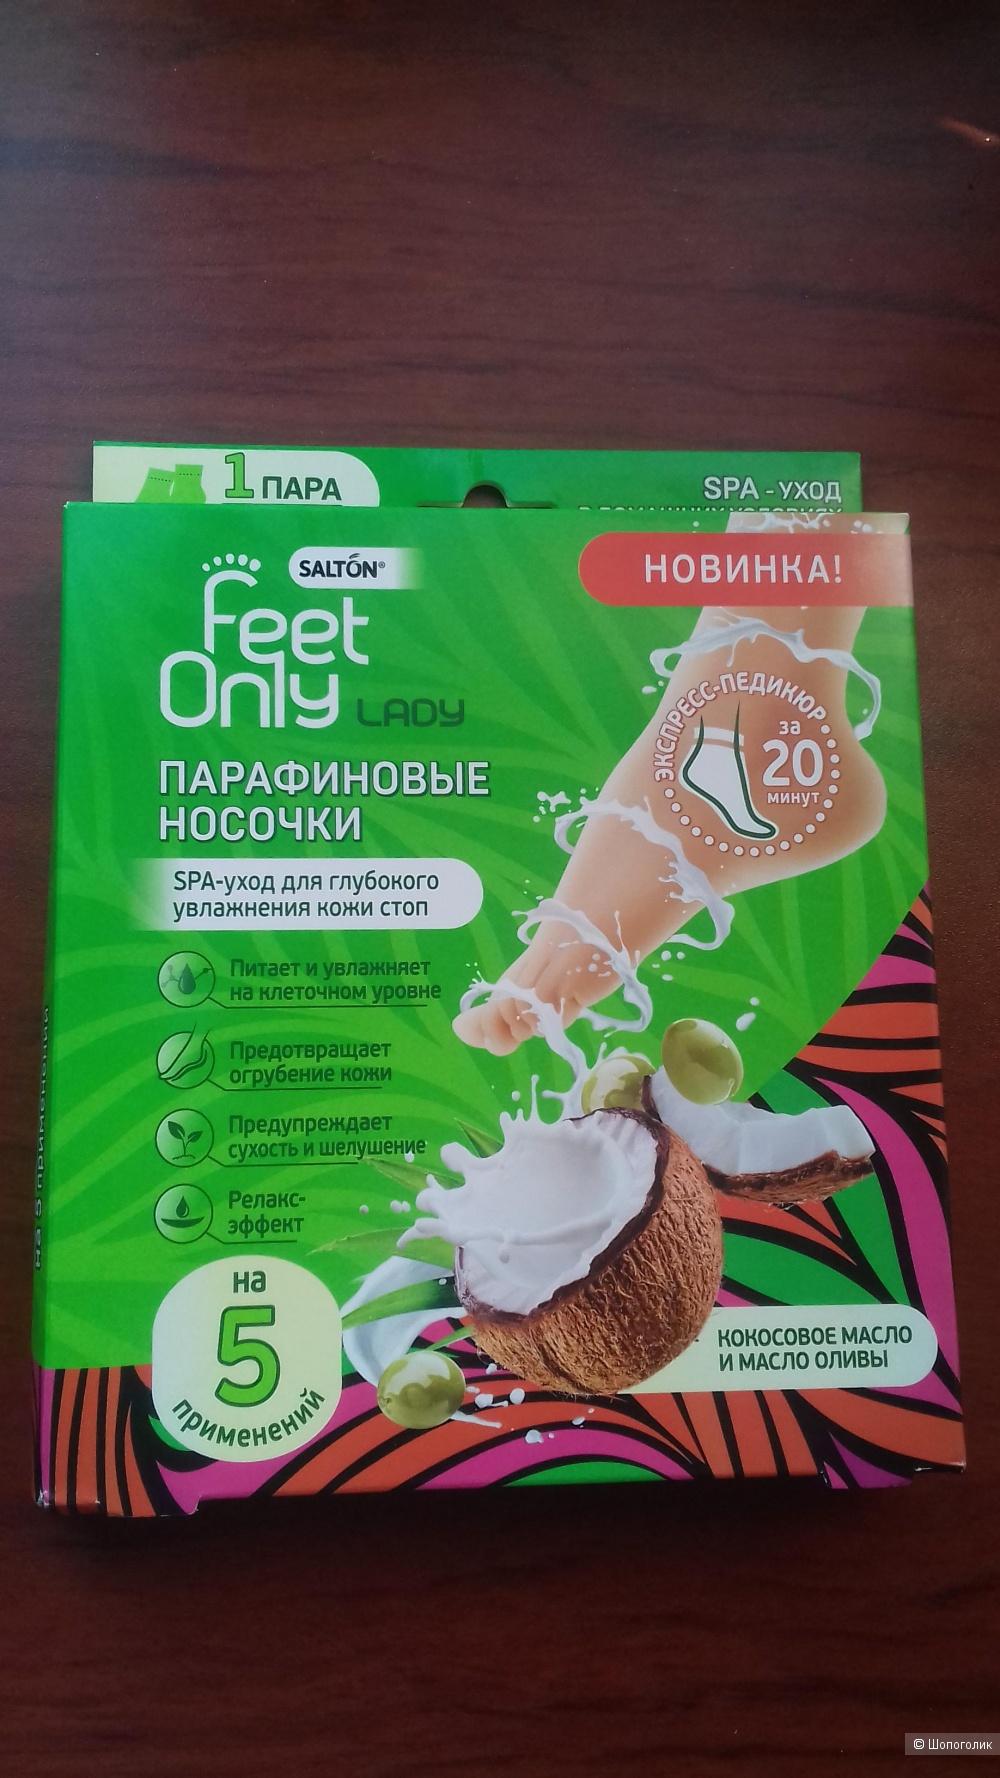 Парафиновые носочки, Salton lady Feet Only, one size